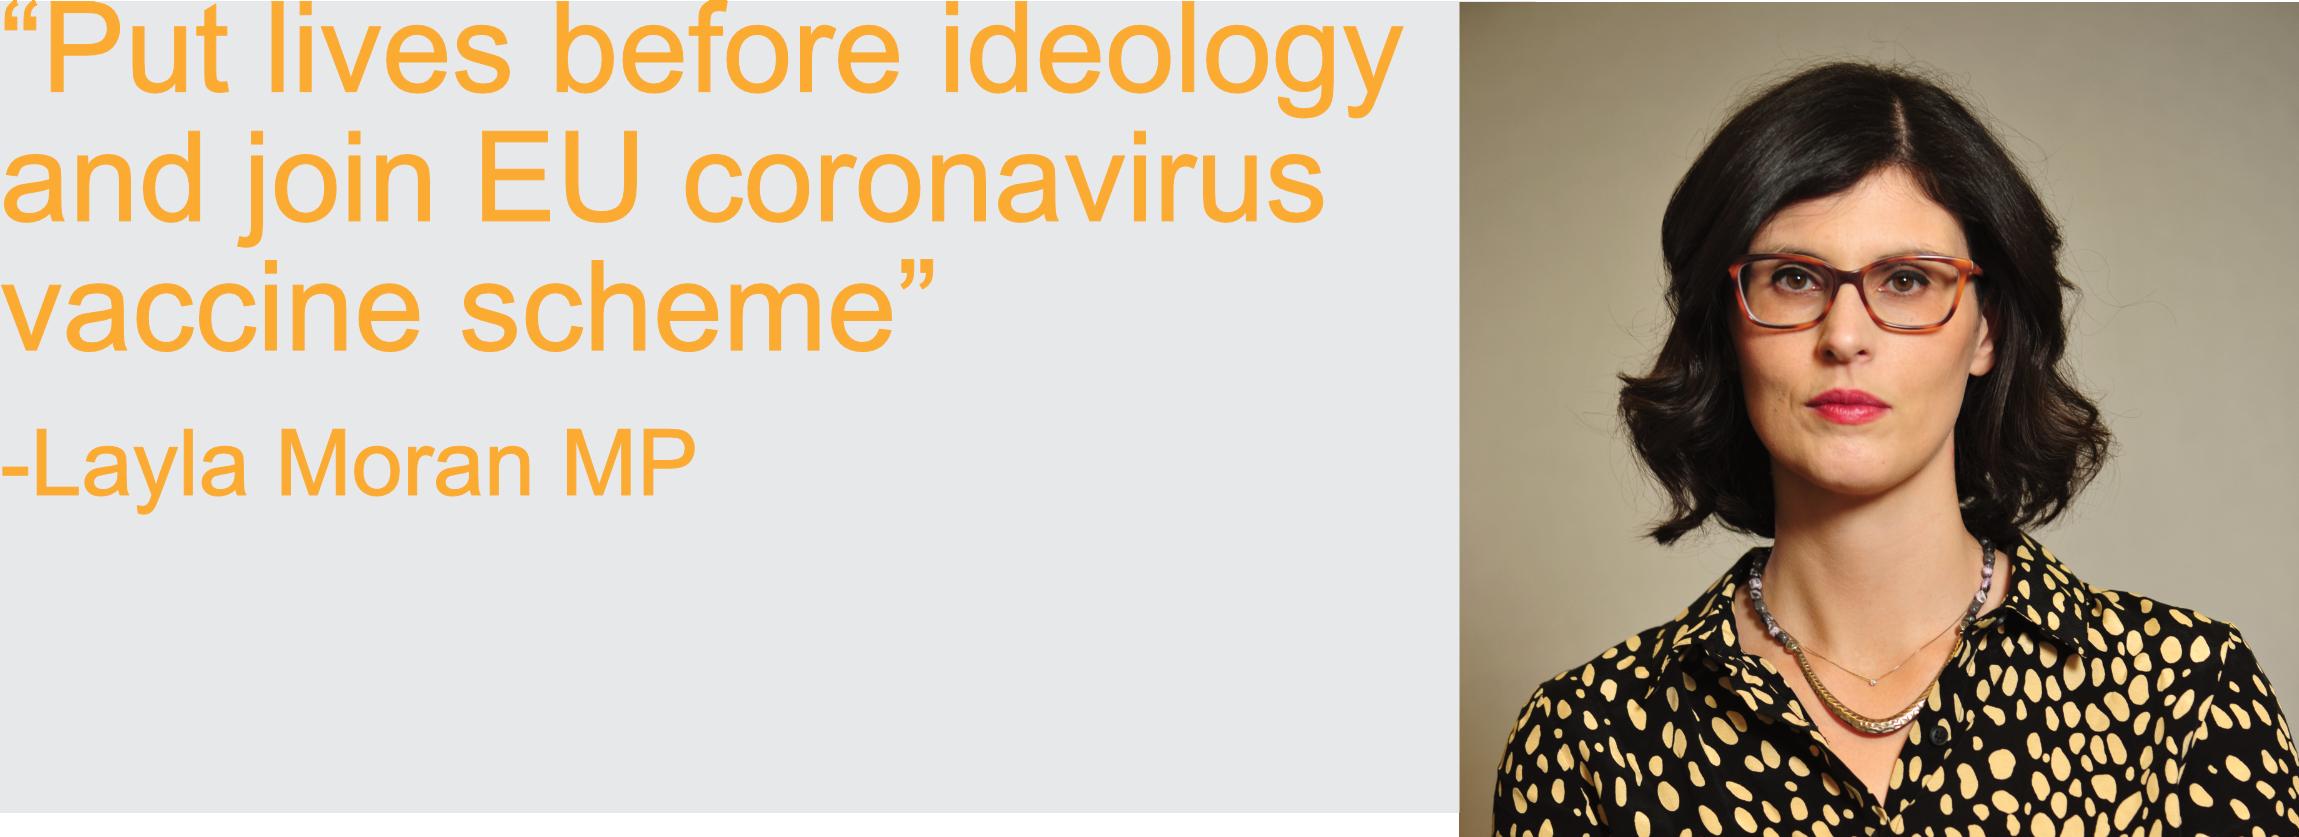 put lives before ideology and join EU coronavirus vaccine scheme